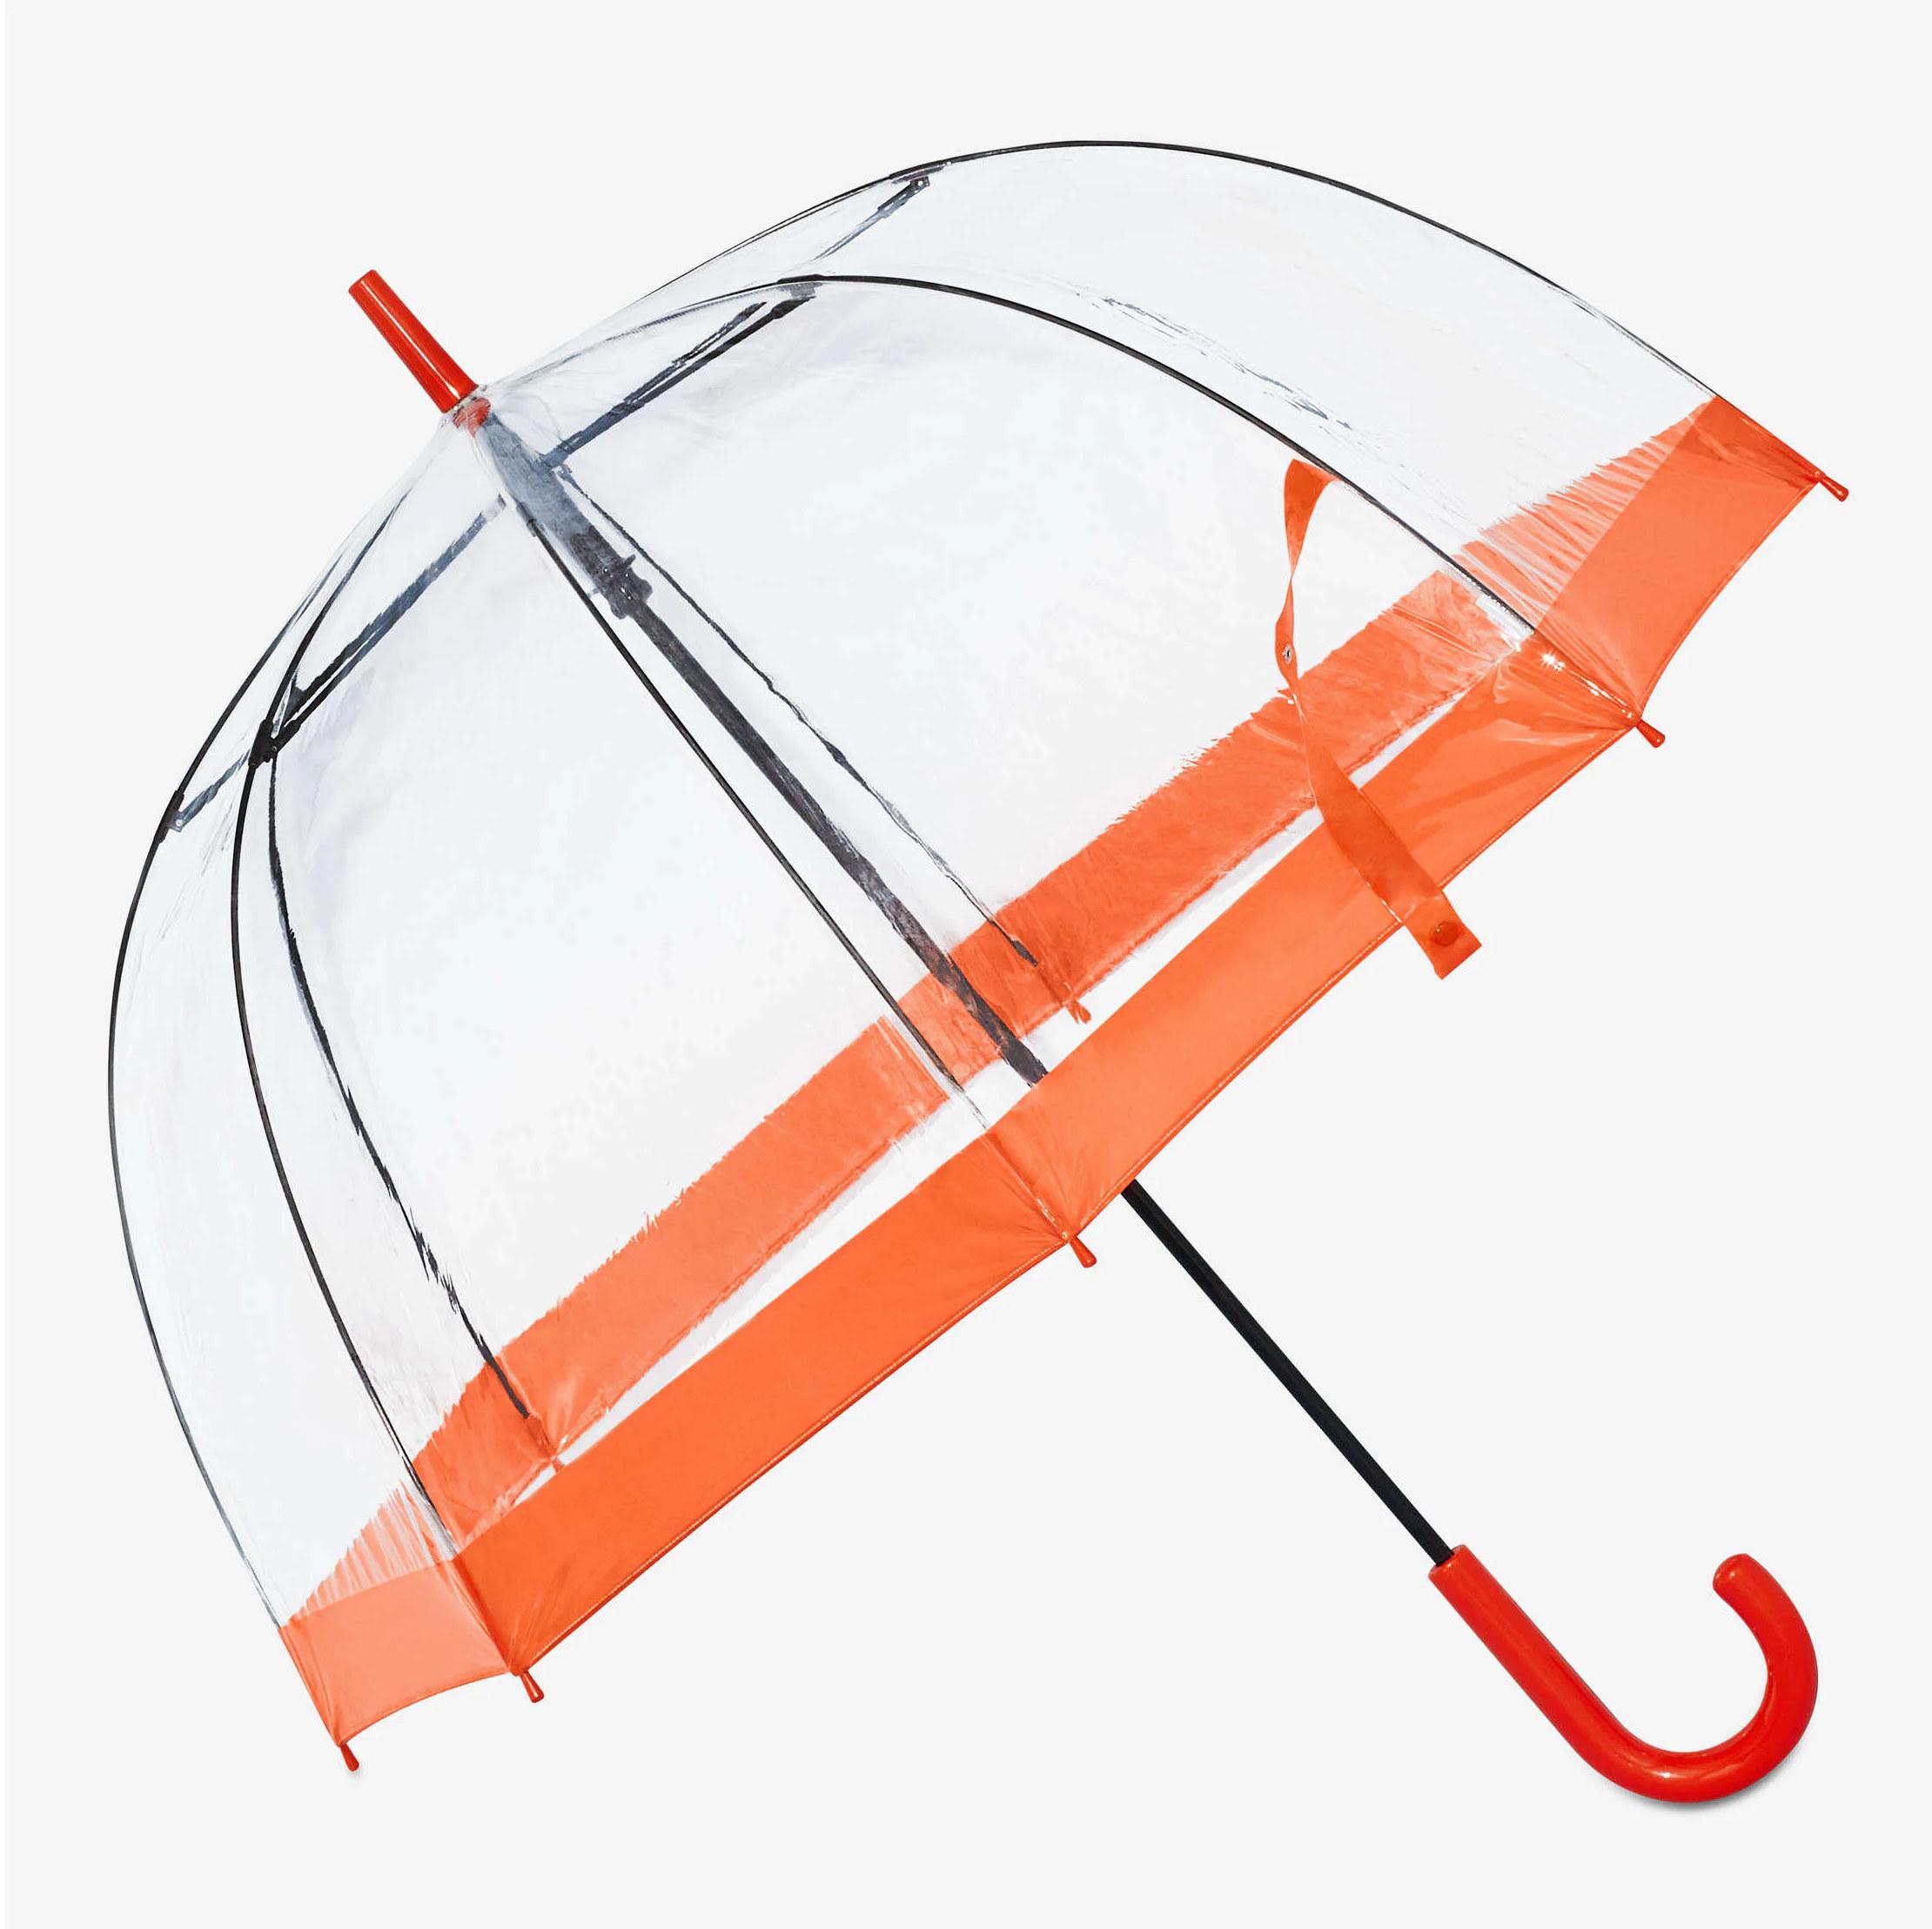 A large umbrella on a plain background